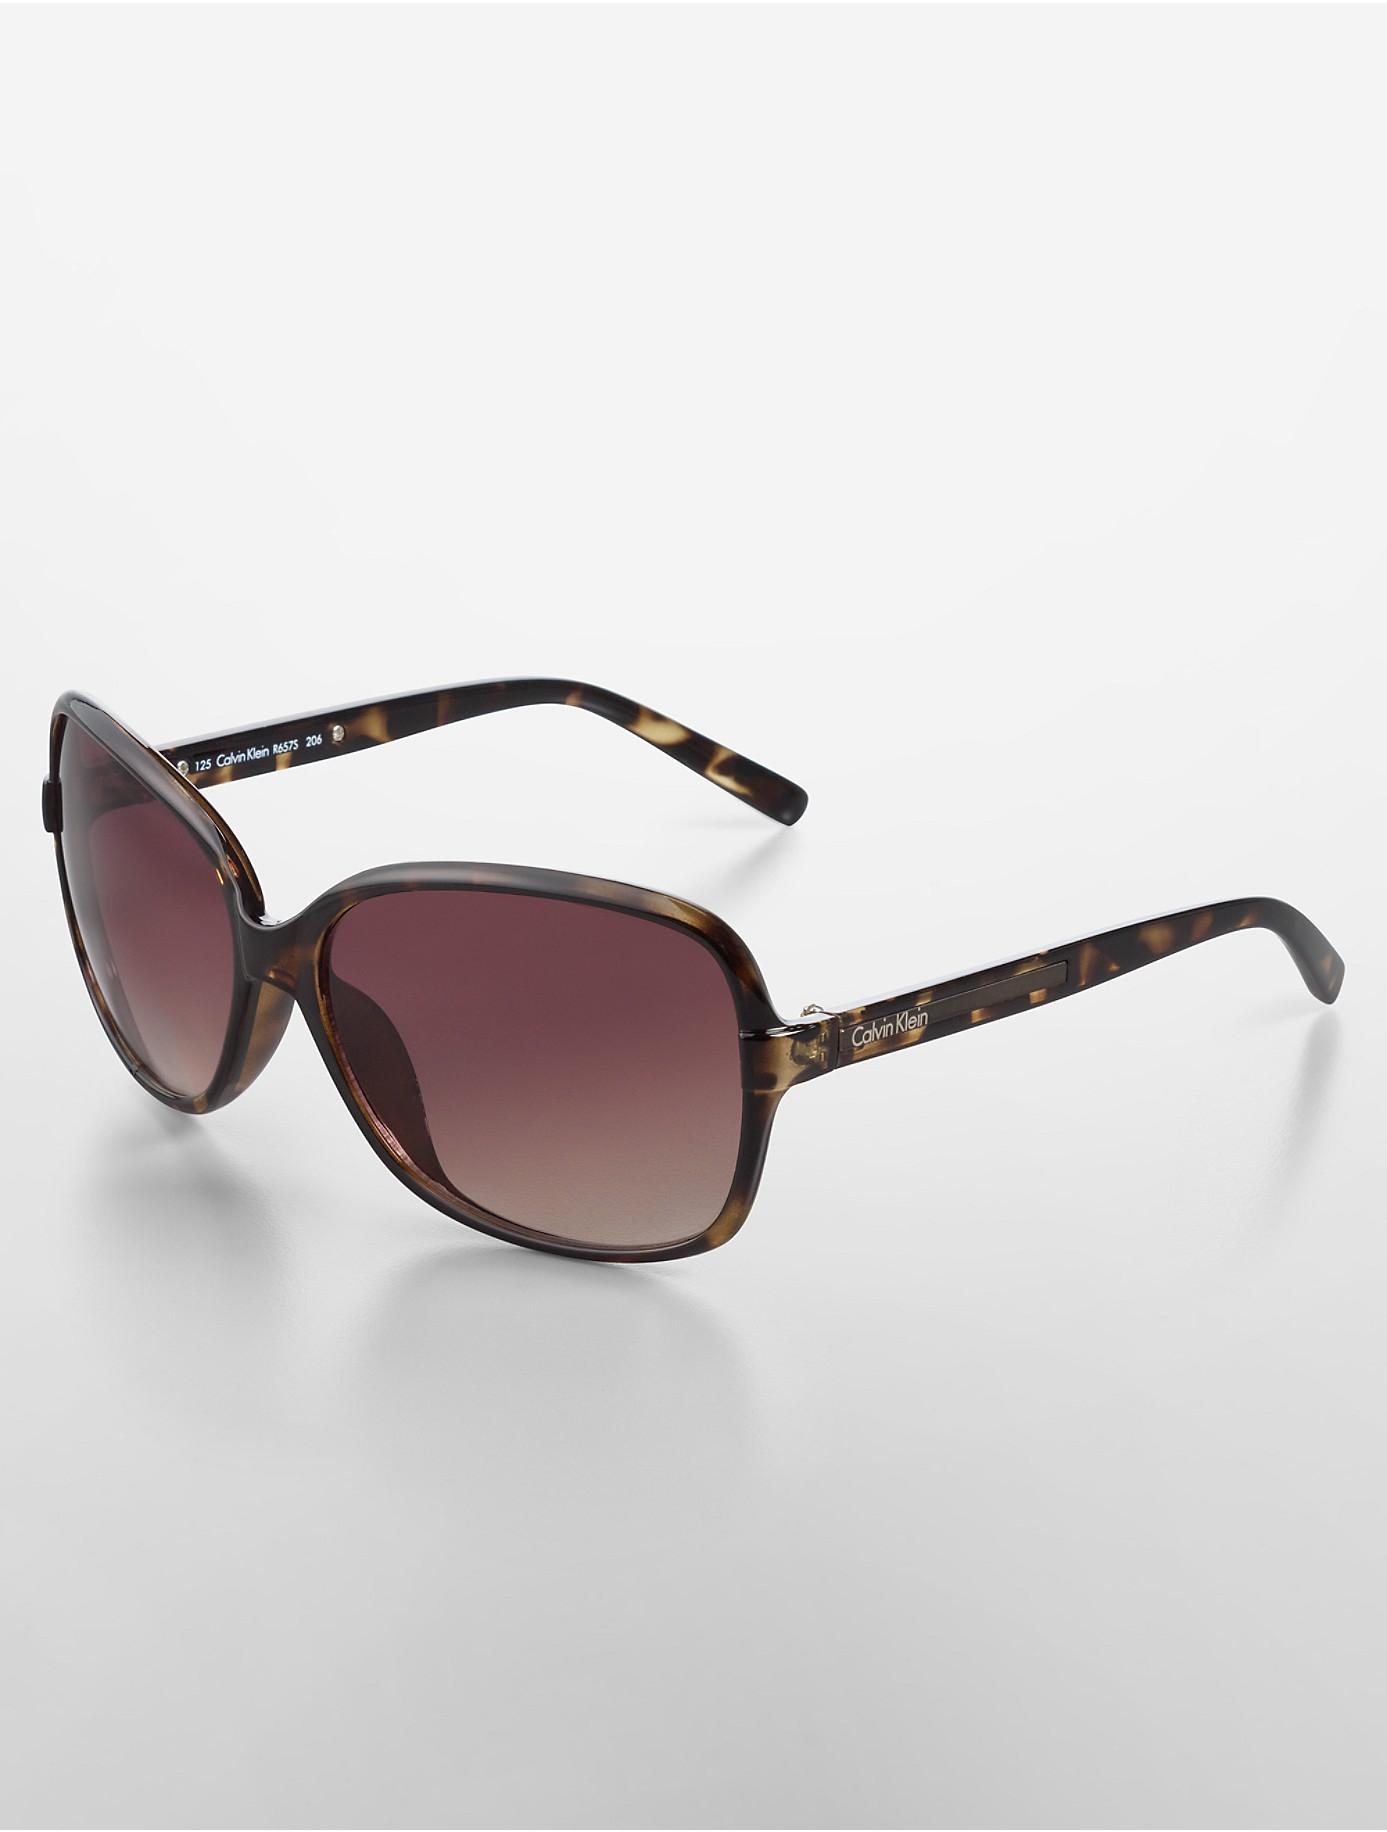 Calvin klein White Label Oversized Square Frame Sunglasses in Brown | Lyst